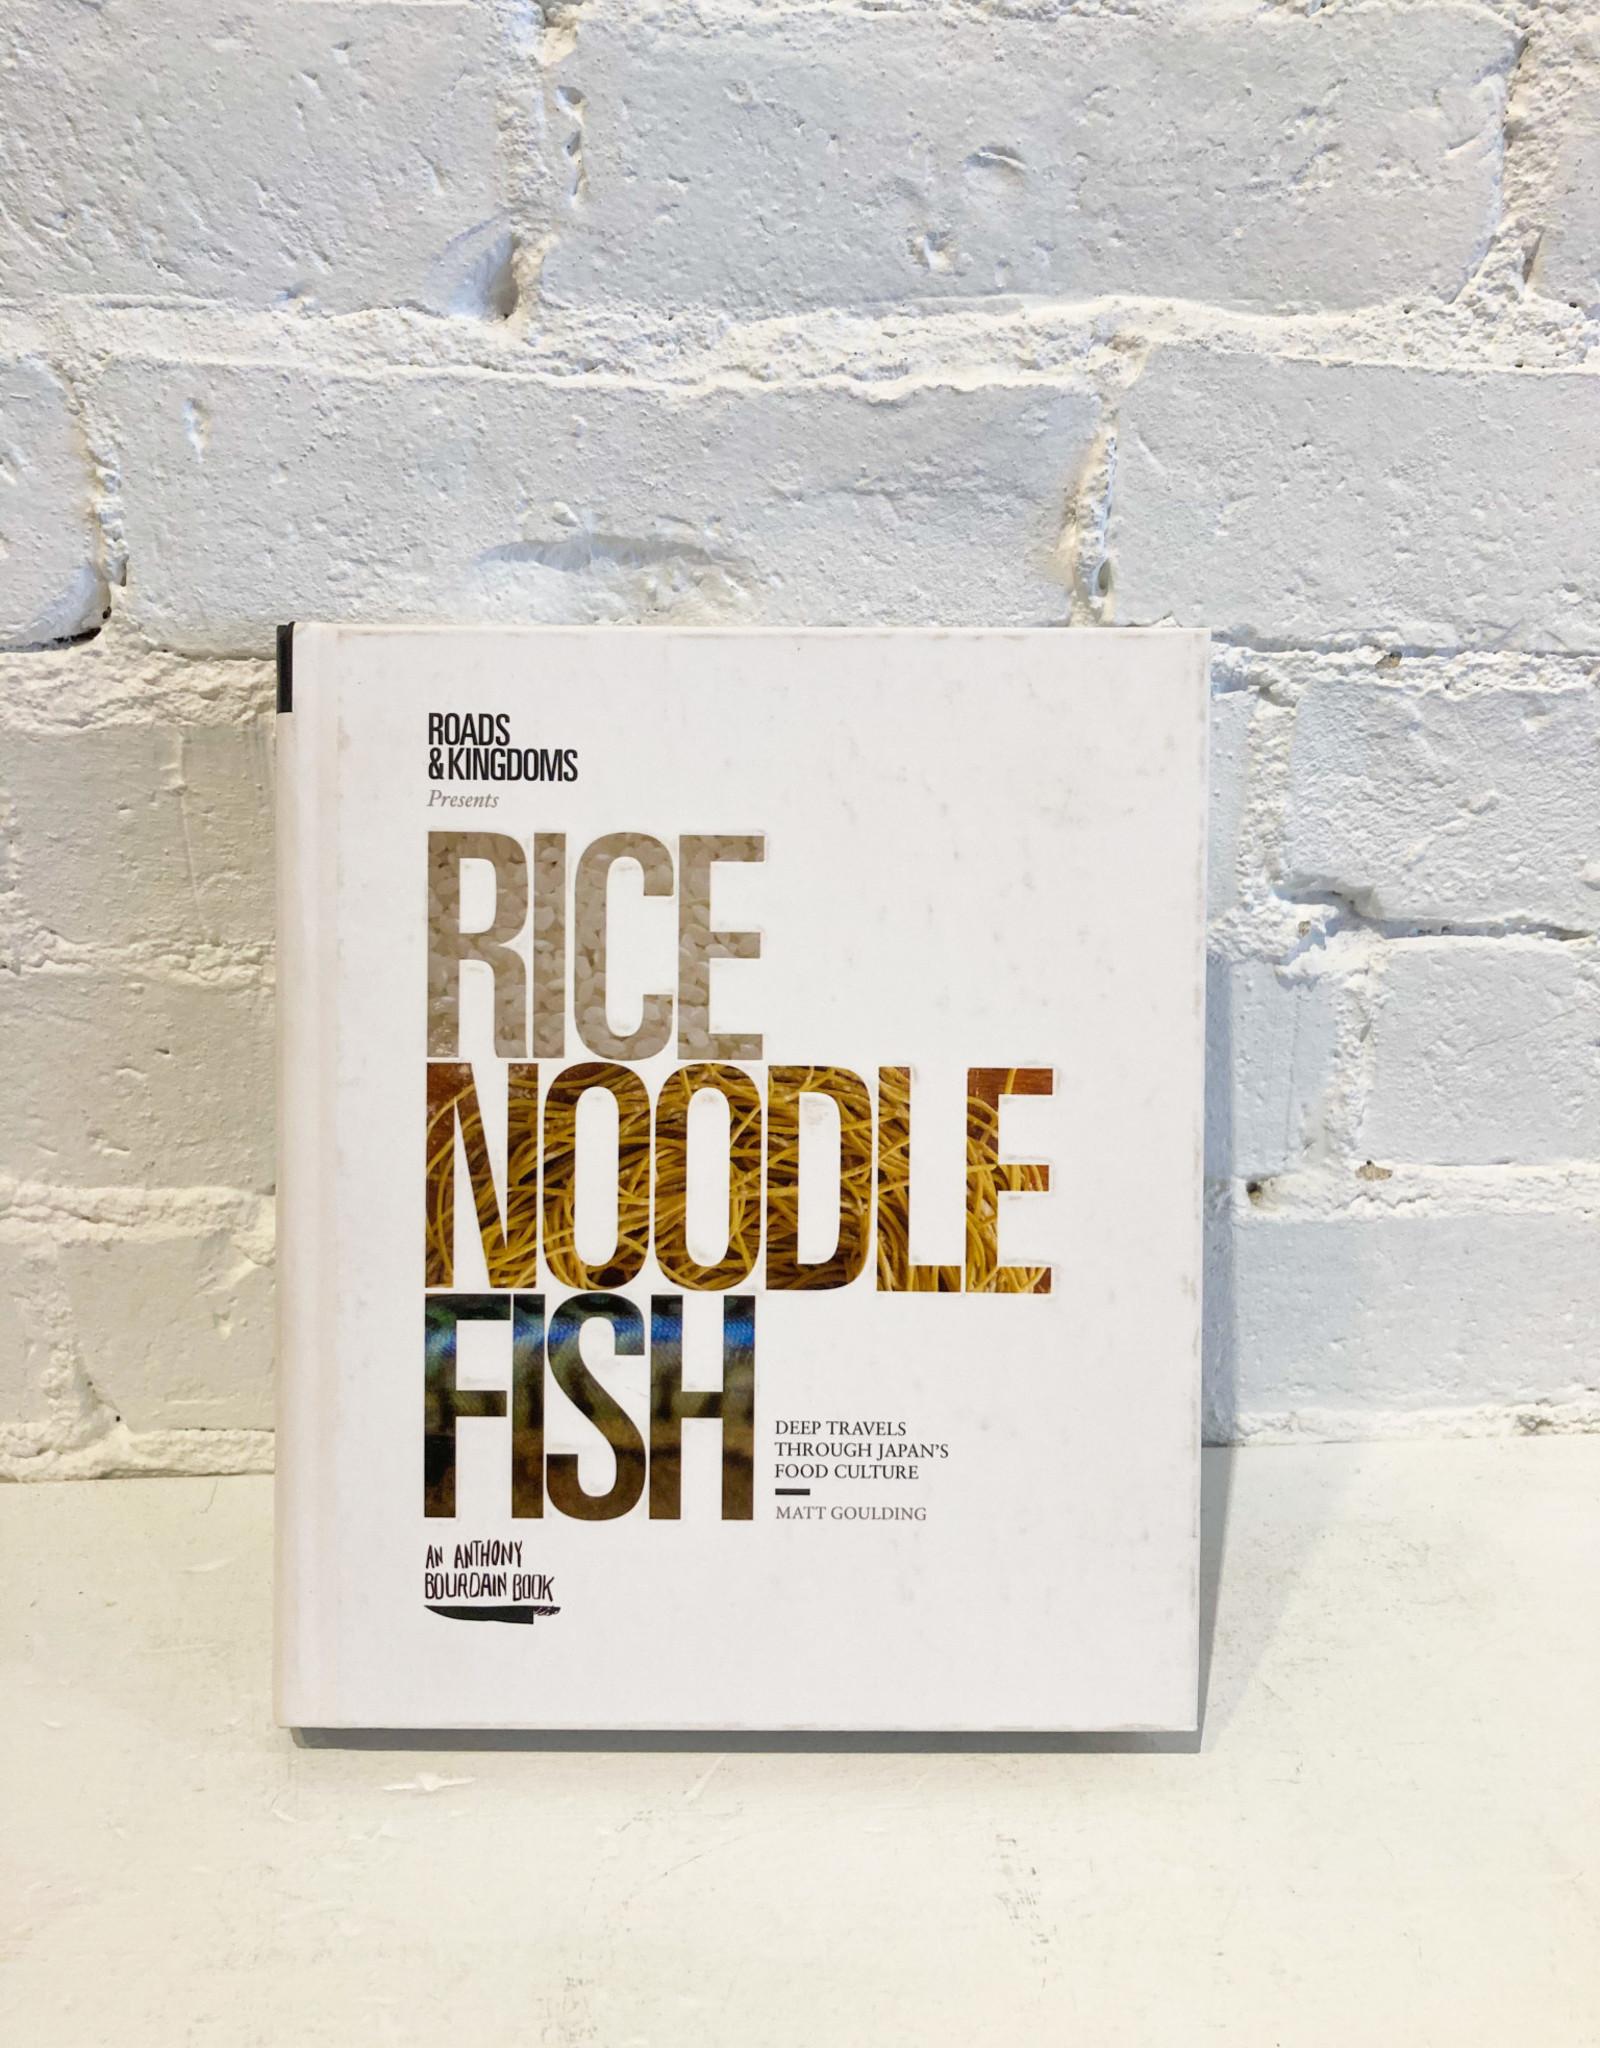 Rice, Noodle, Fish: Deep Travels Through Japan's Food Culture by Matt Goulding